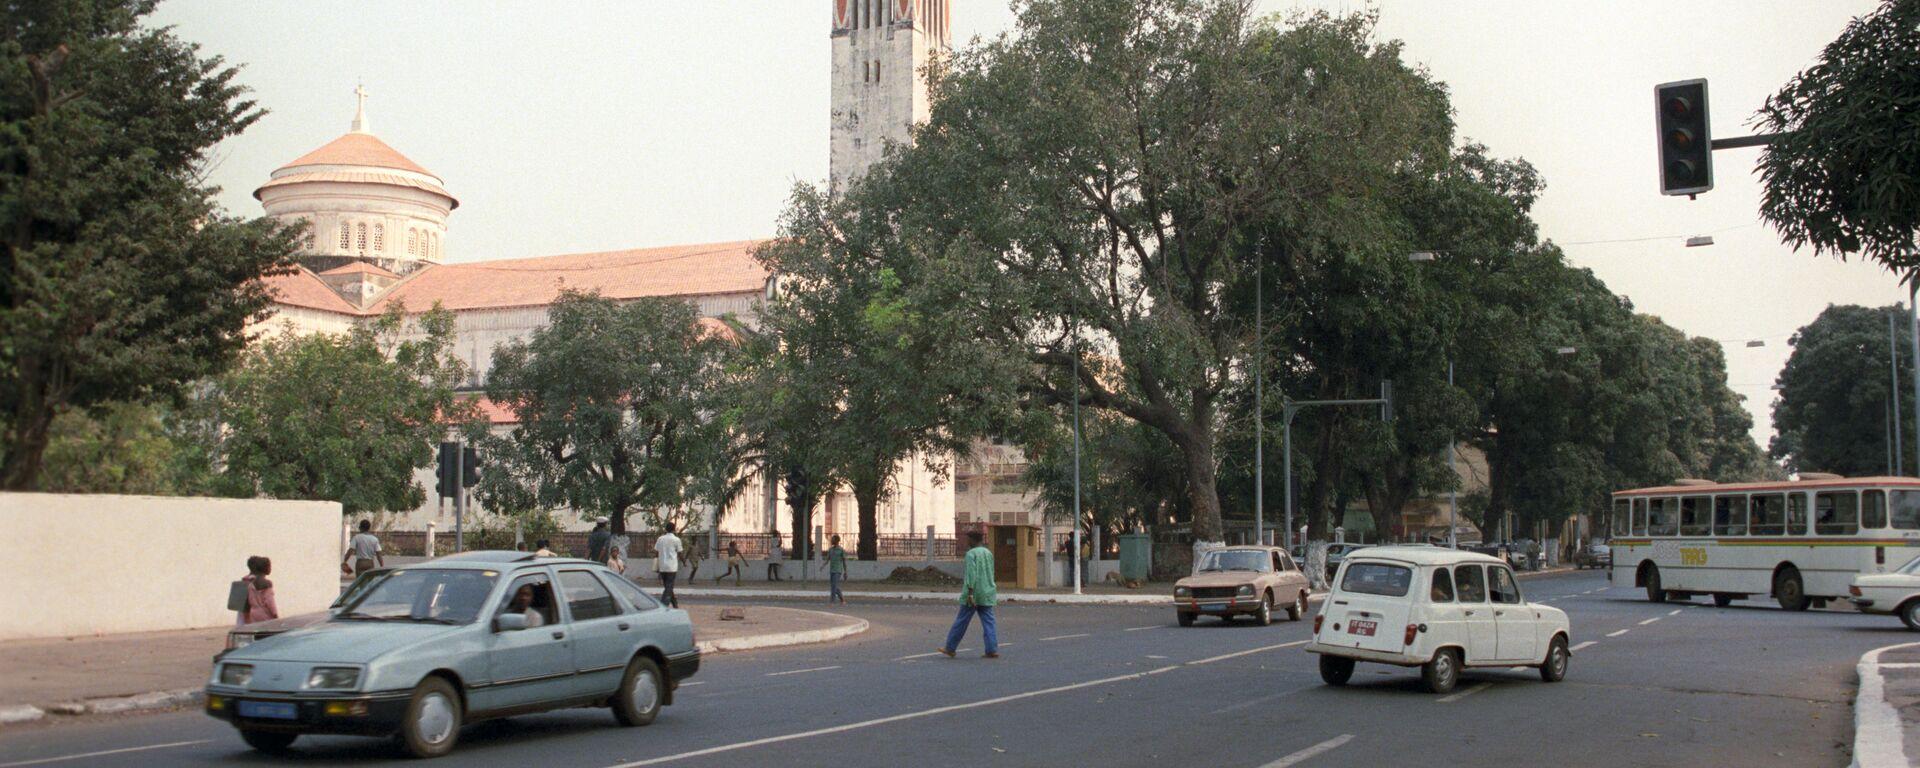 Conakry - Sputnik France, 1920, 05.09.2021